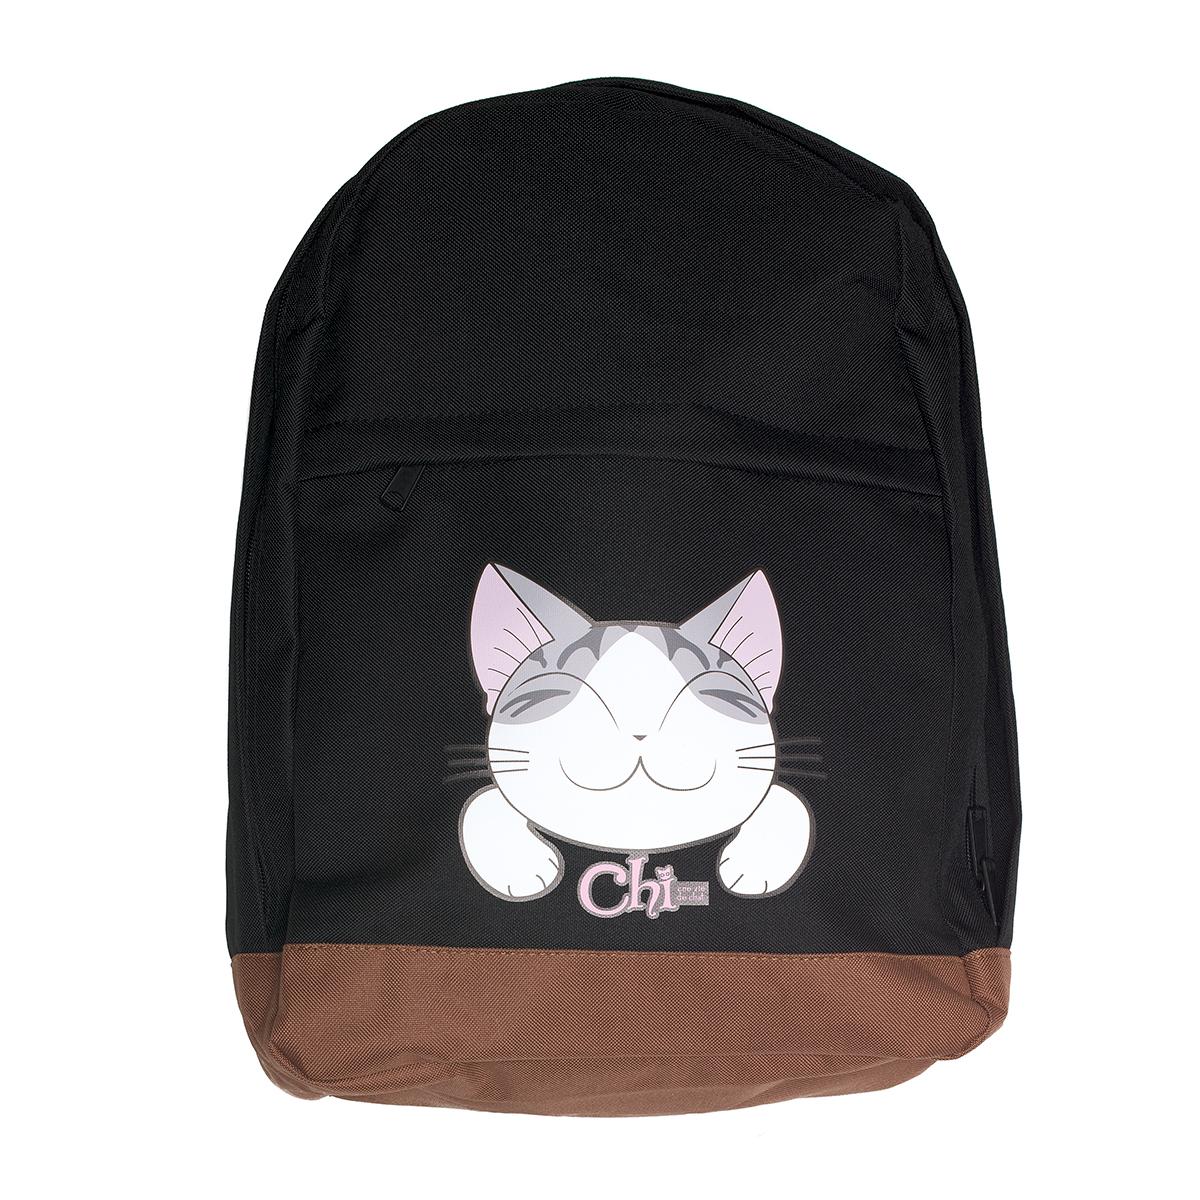 Chi's Sweet Home rucksack